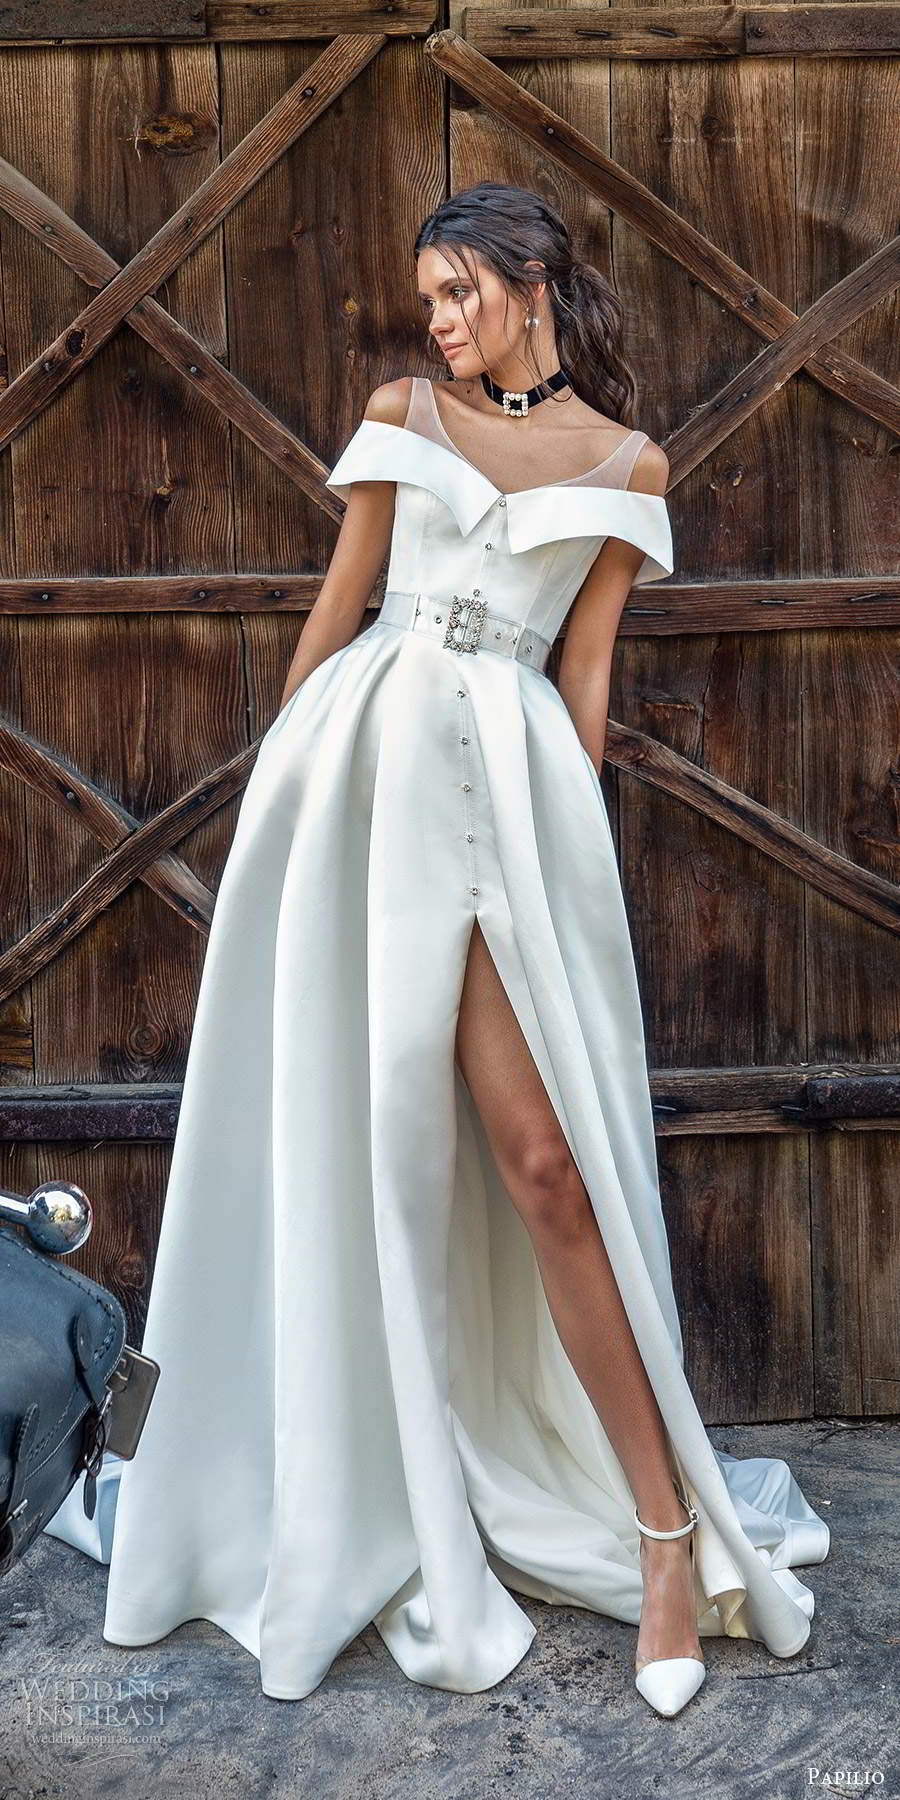 papili 2020 freedom bridal off shoulder sleeves illusion straps clean minimalist a line ball gown wedding dress slit skirt chapel train (1) fv